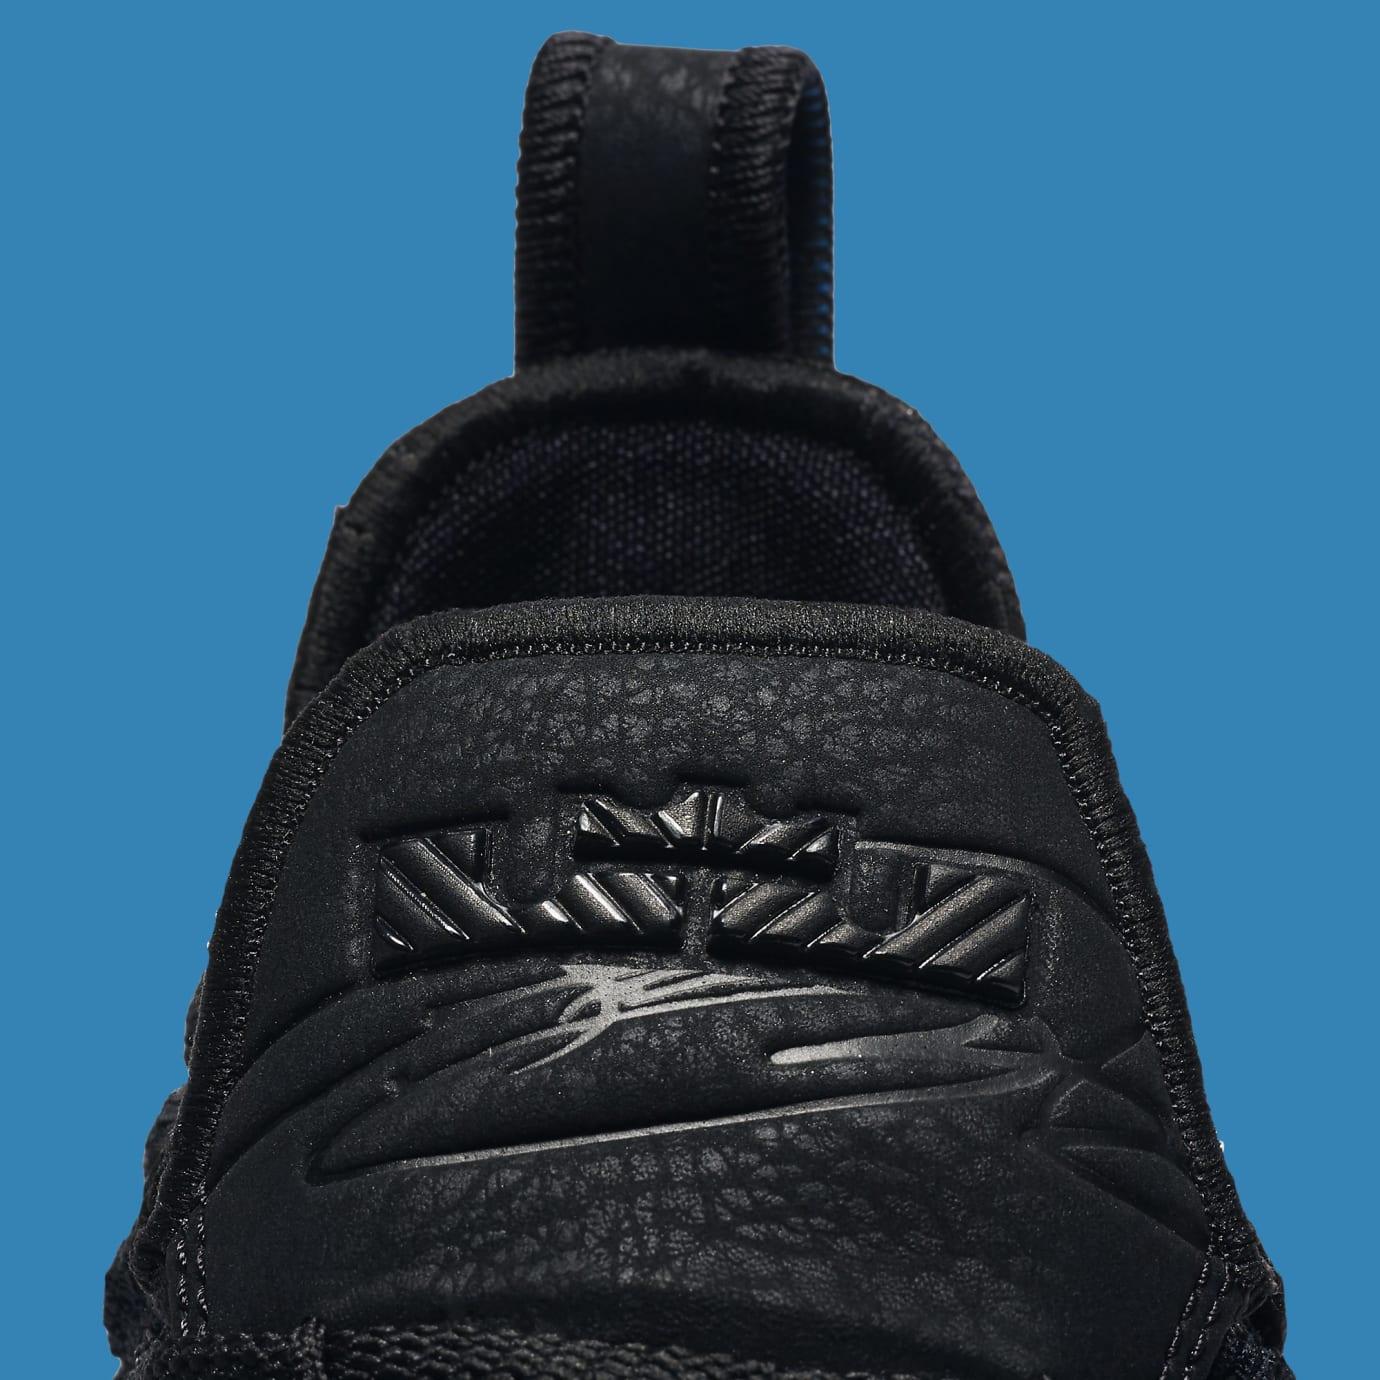 248cd30477b79 Image via Nike Nike LeBron 16 I Promise Release Date AO2595-004 Tongue